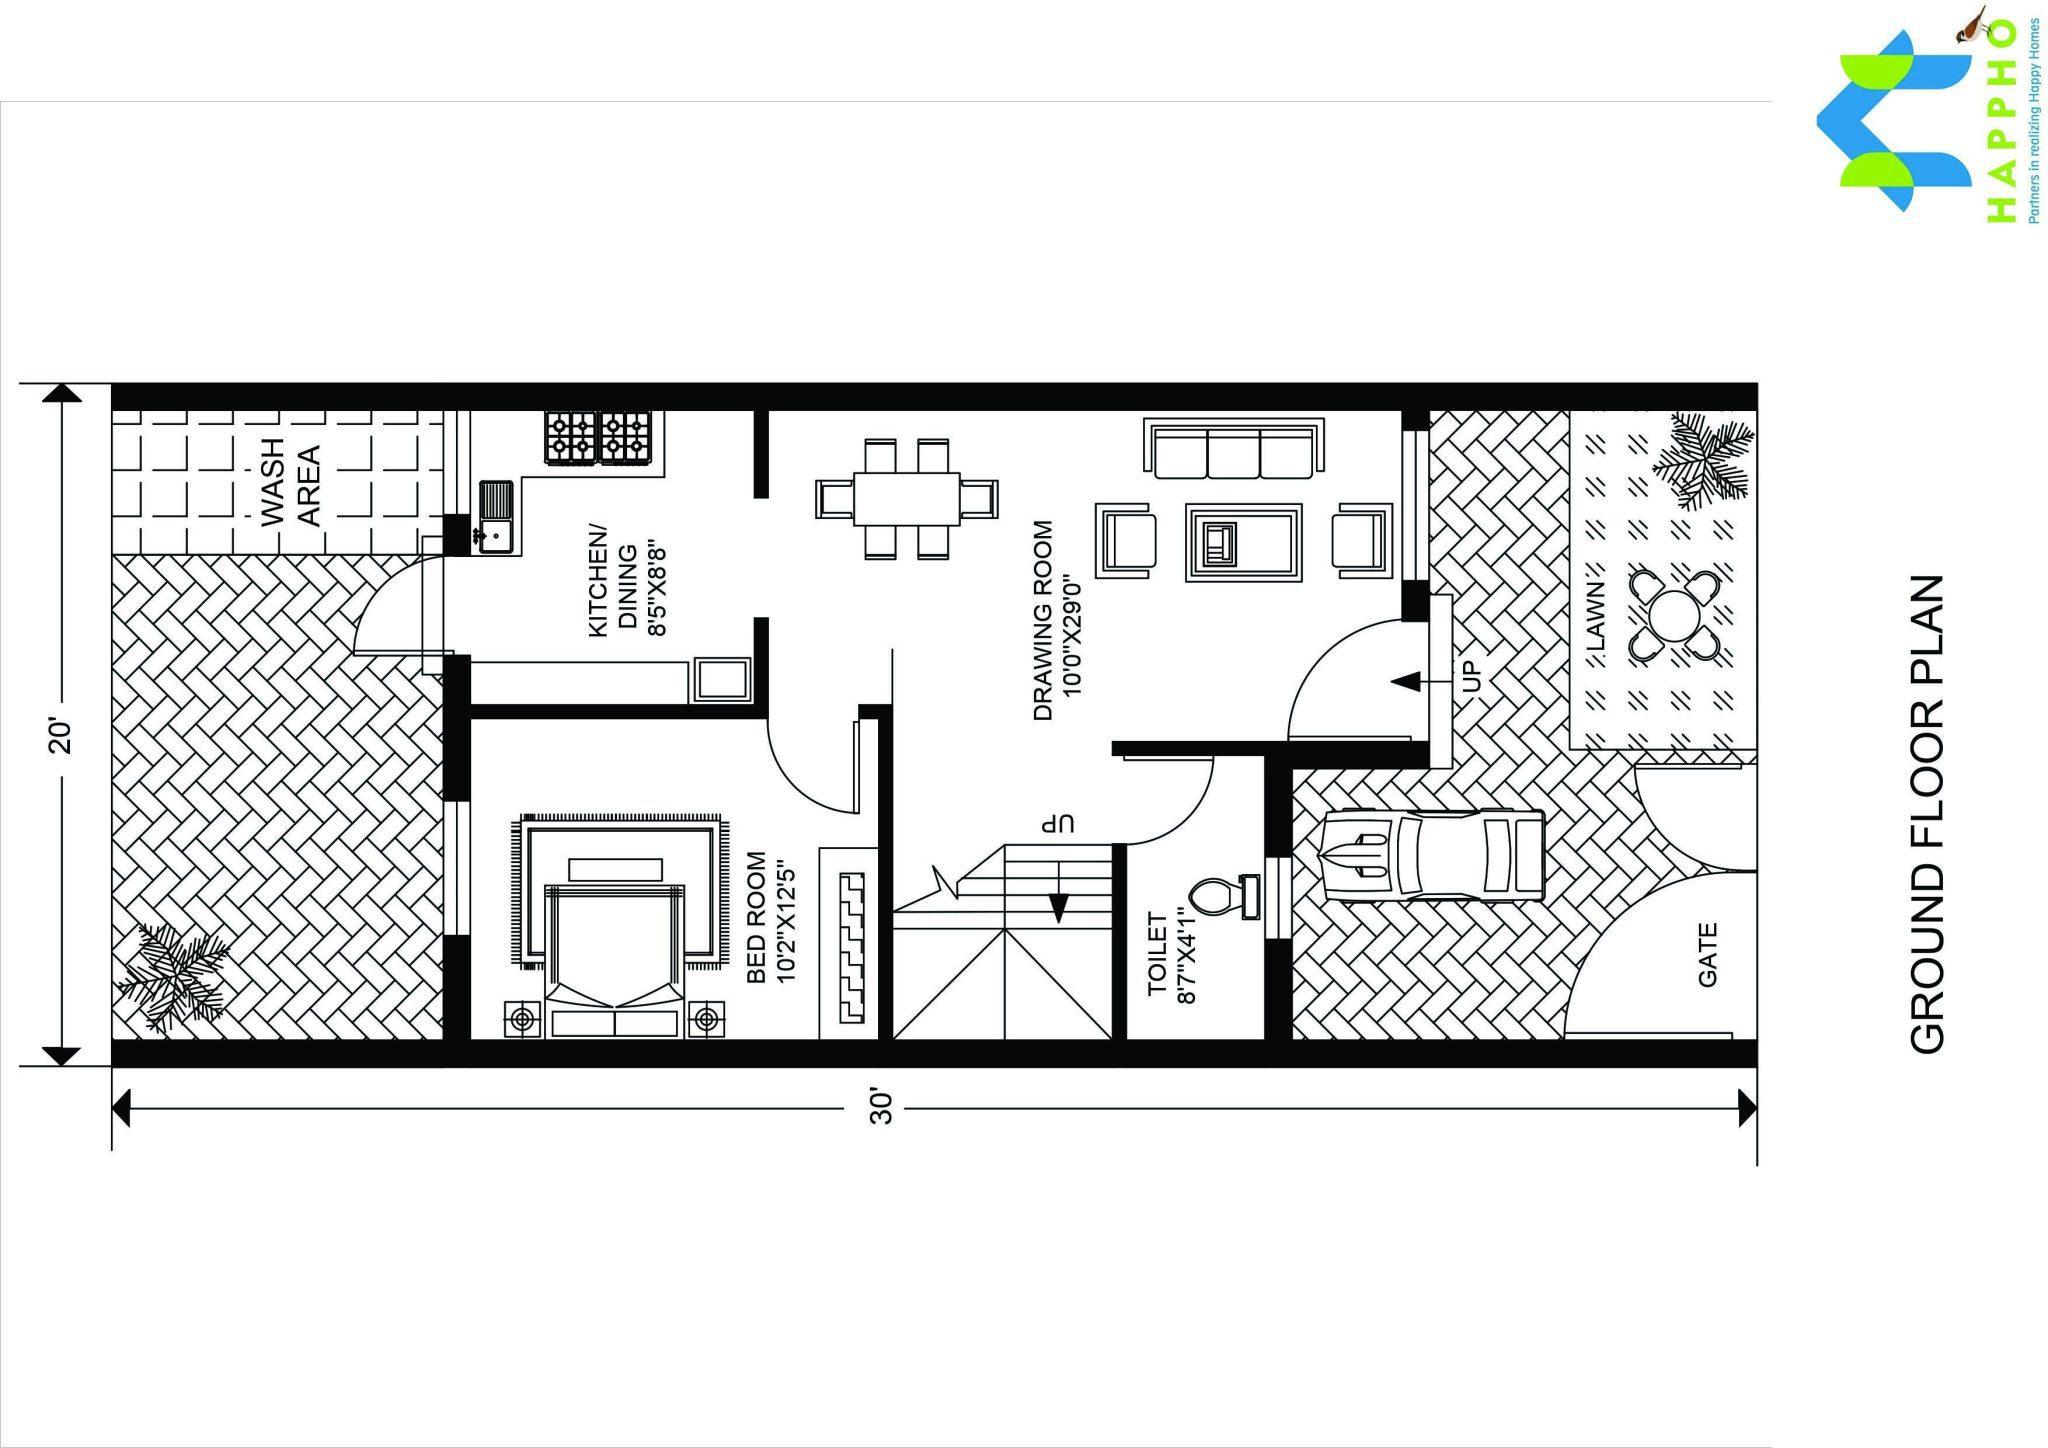 3 Bhk Floor Plan For 30 X 20 Feet Plot 600 Square Feet